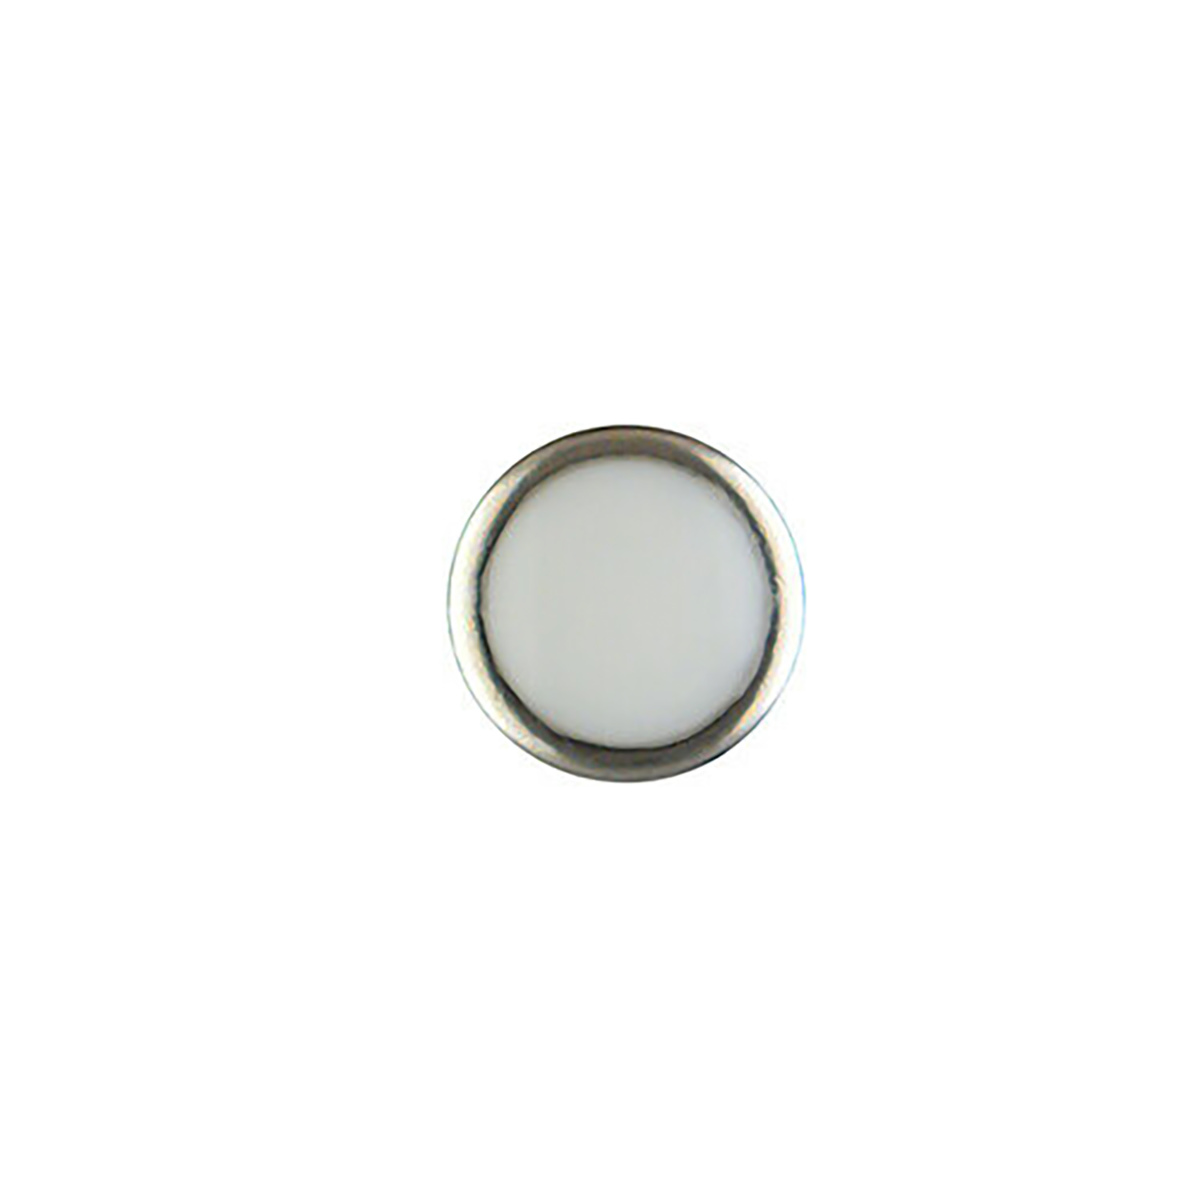 PEARL PIP FOR BEZEL INSERT FOR 43MM ROLEX SEADWELLER CERAMIC 126600 BLUE LUME